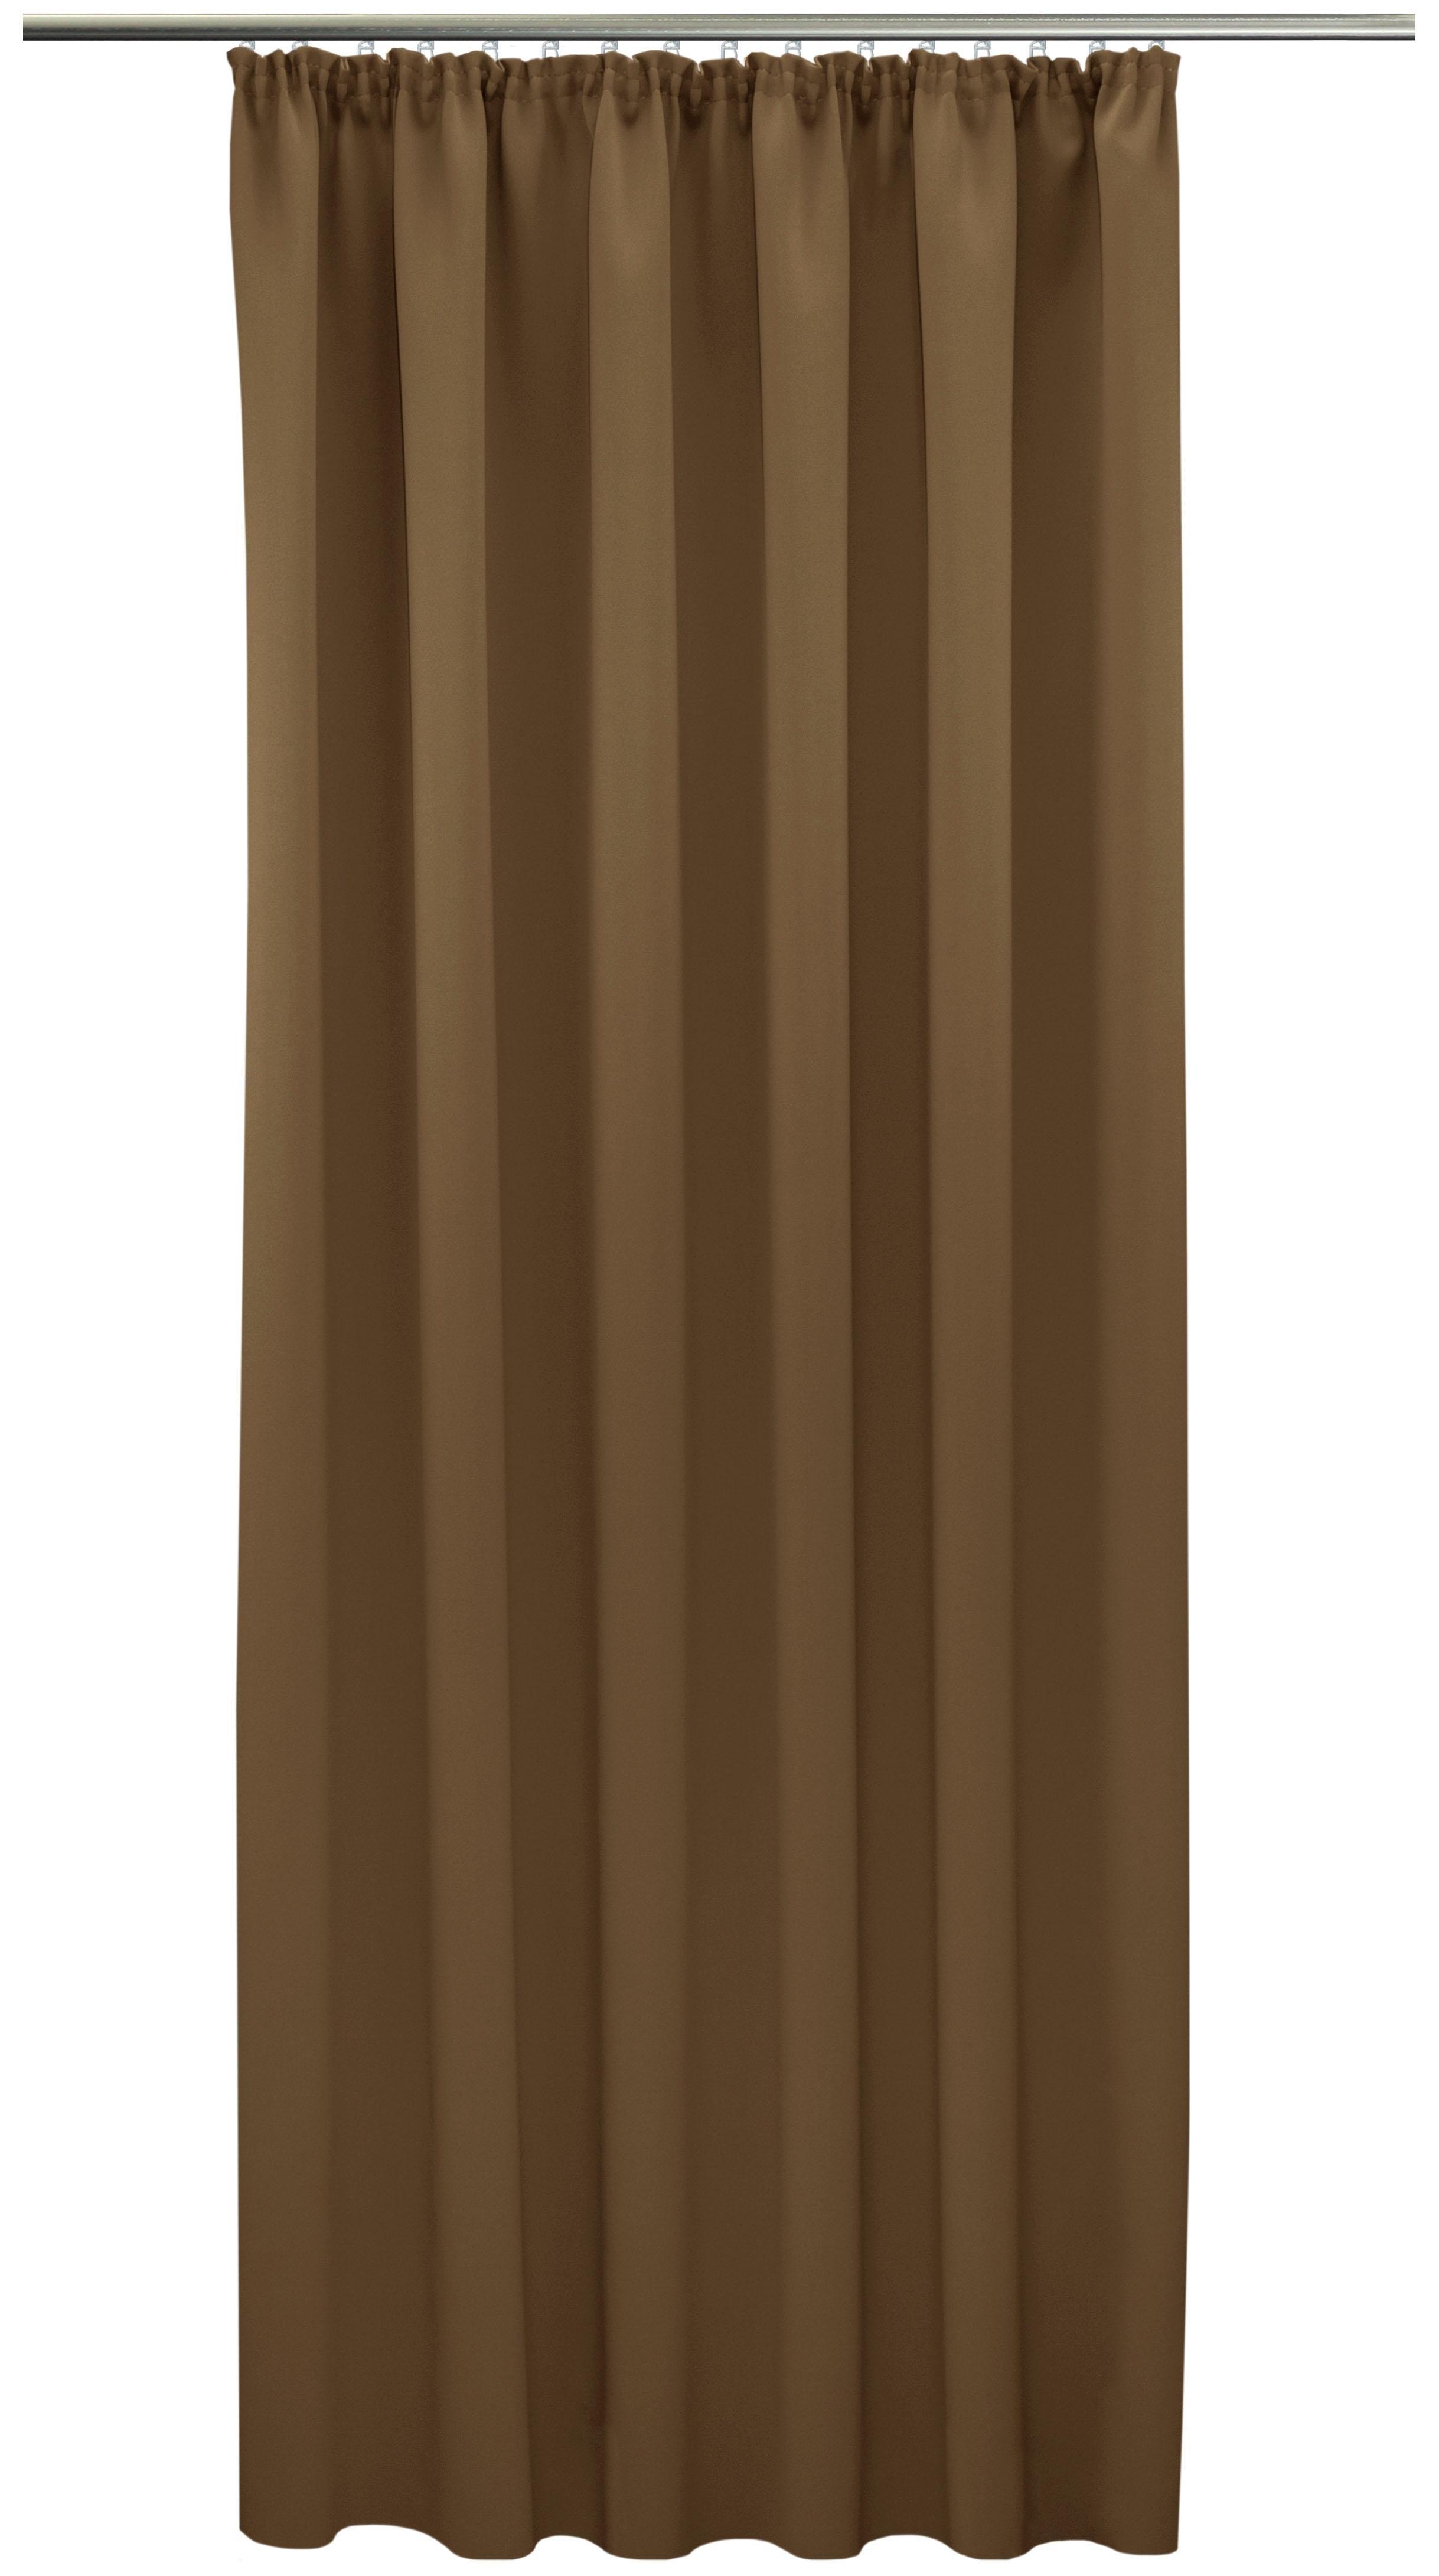 Vhg Gordijn, »Leon«, rimpelband, per stuk veilig op otto.nl kopen